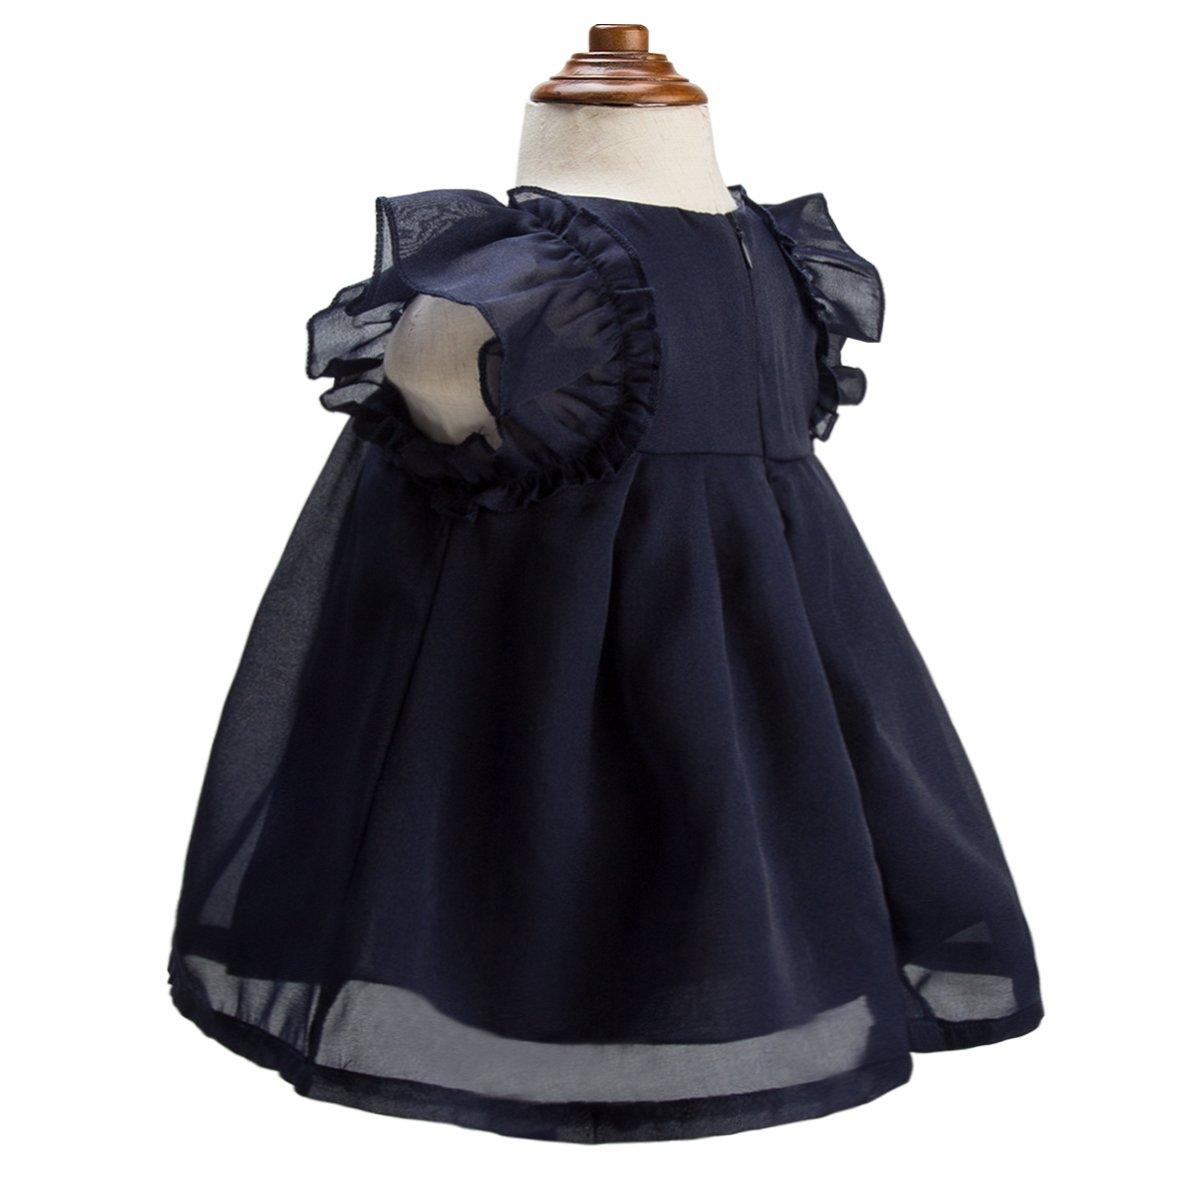 d75e2f46ed61 Amazon.com  mubenshang Baby Girl Dresses Casual Dresses Infant Toddler  Dresses 0-3-6-9-12-18-24 Months  Clothing